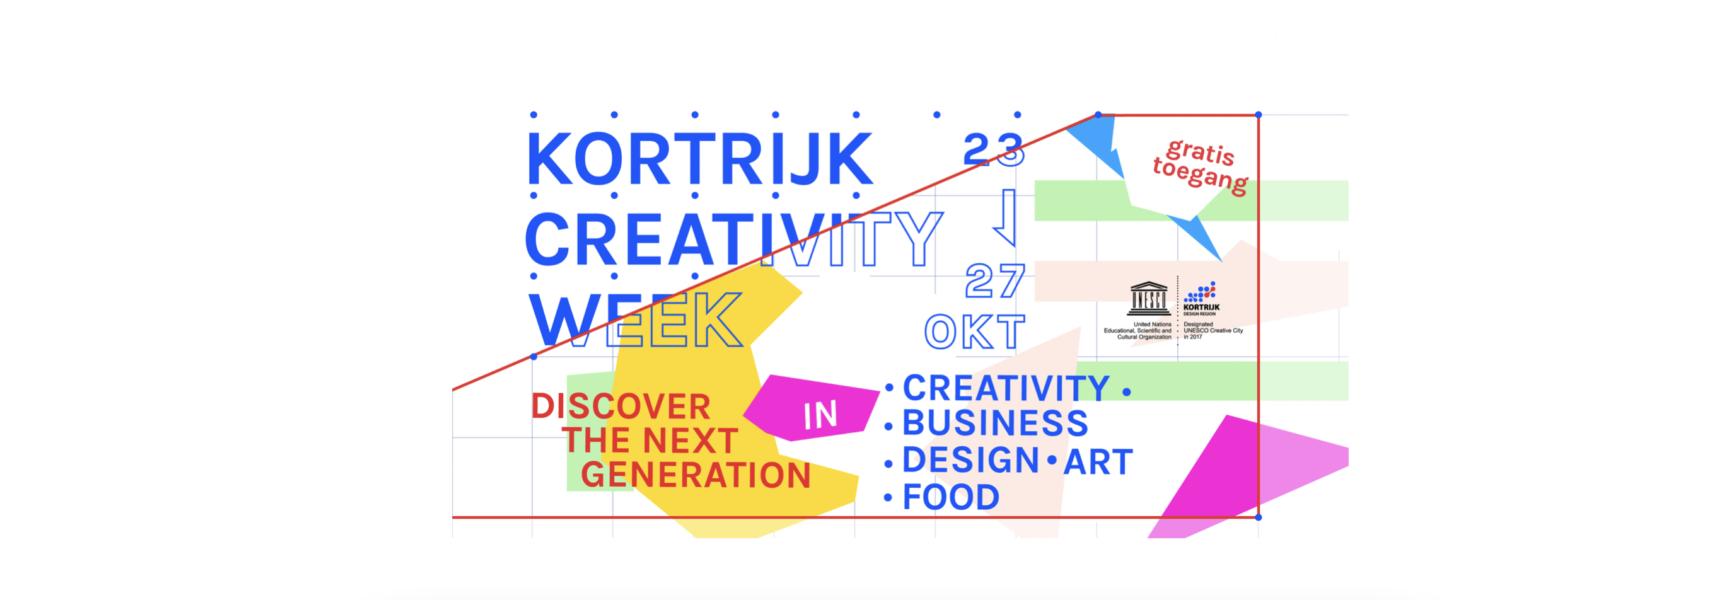 Kortrijk Creativity week we are the next generation 2019